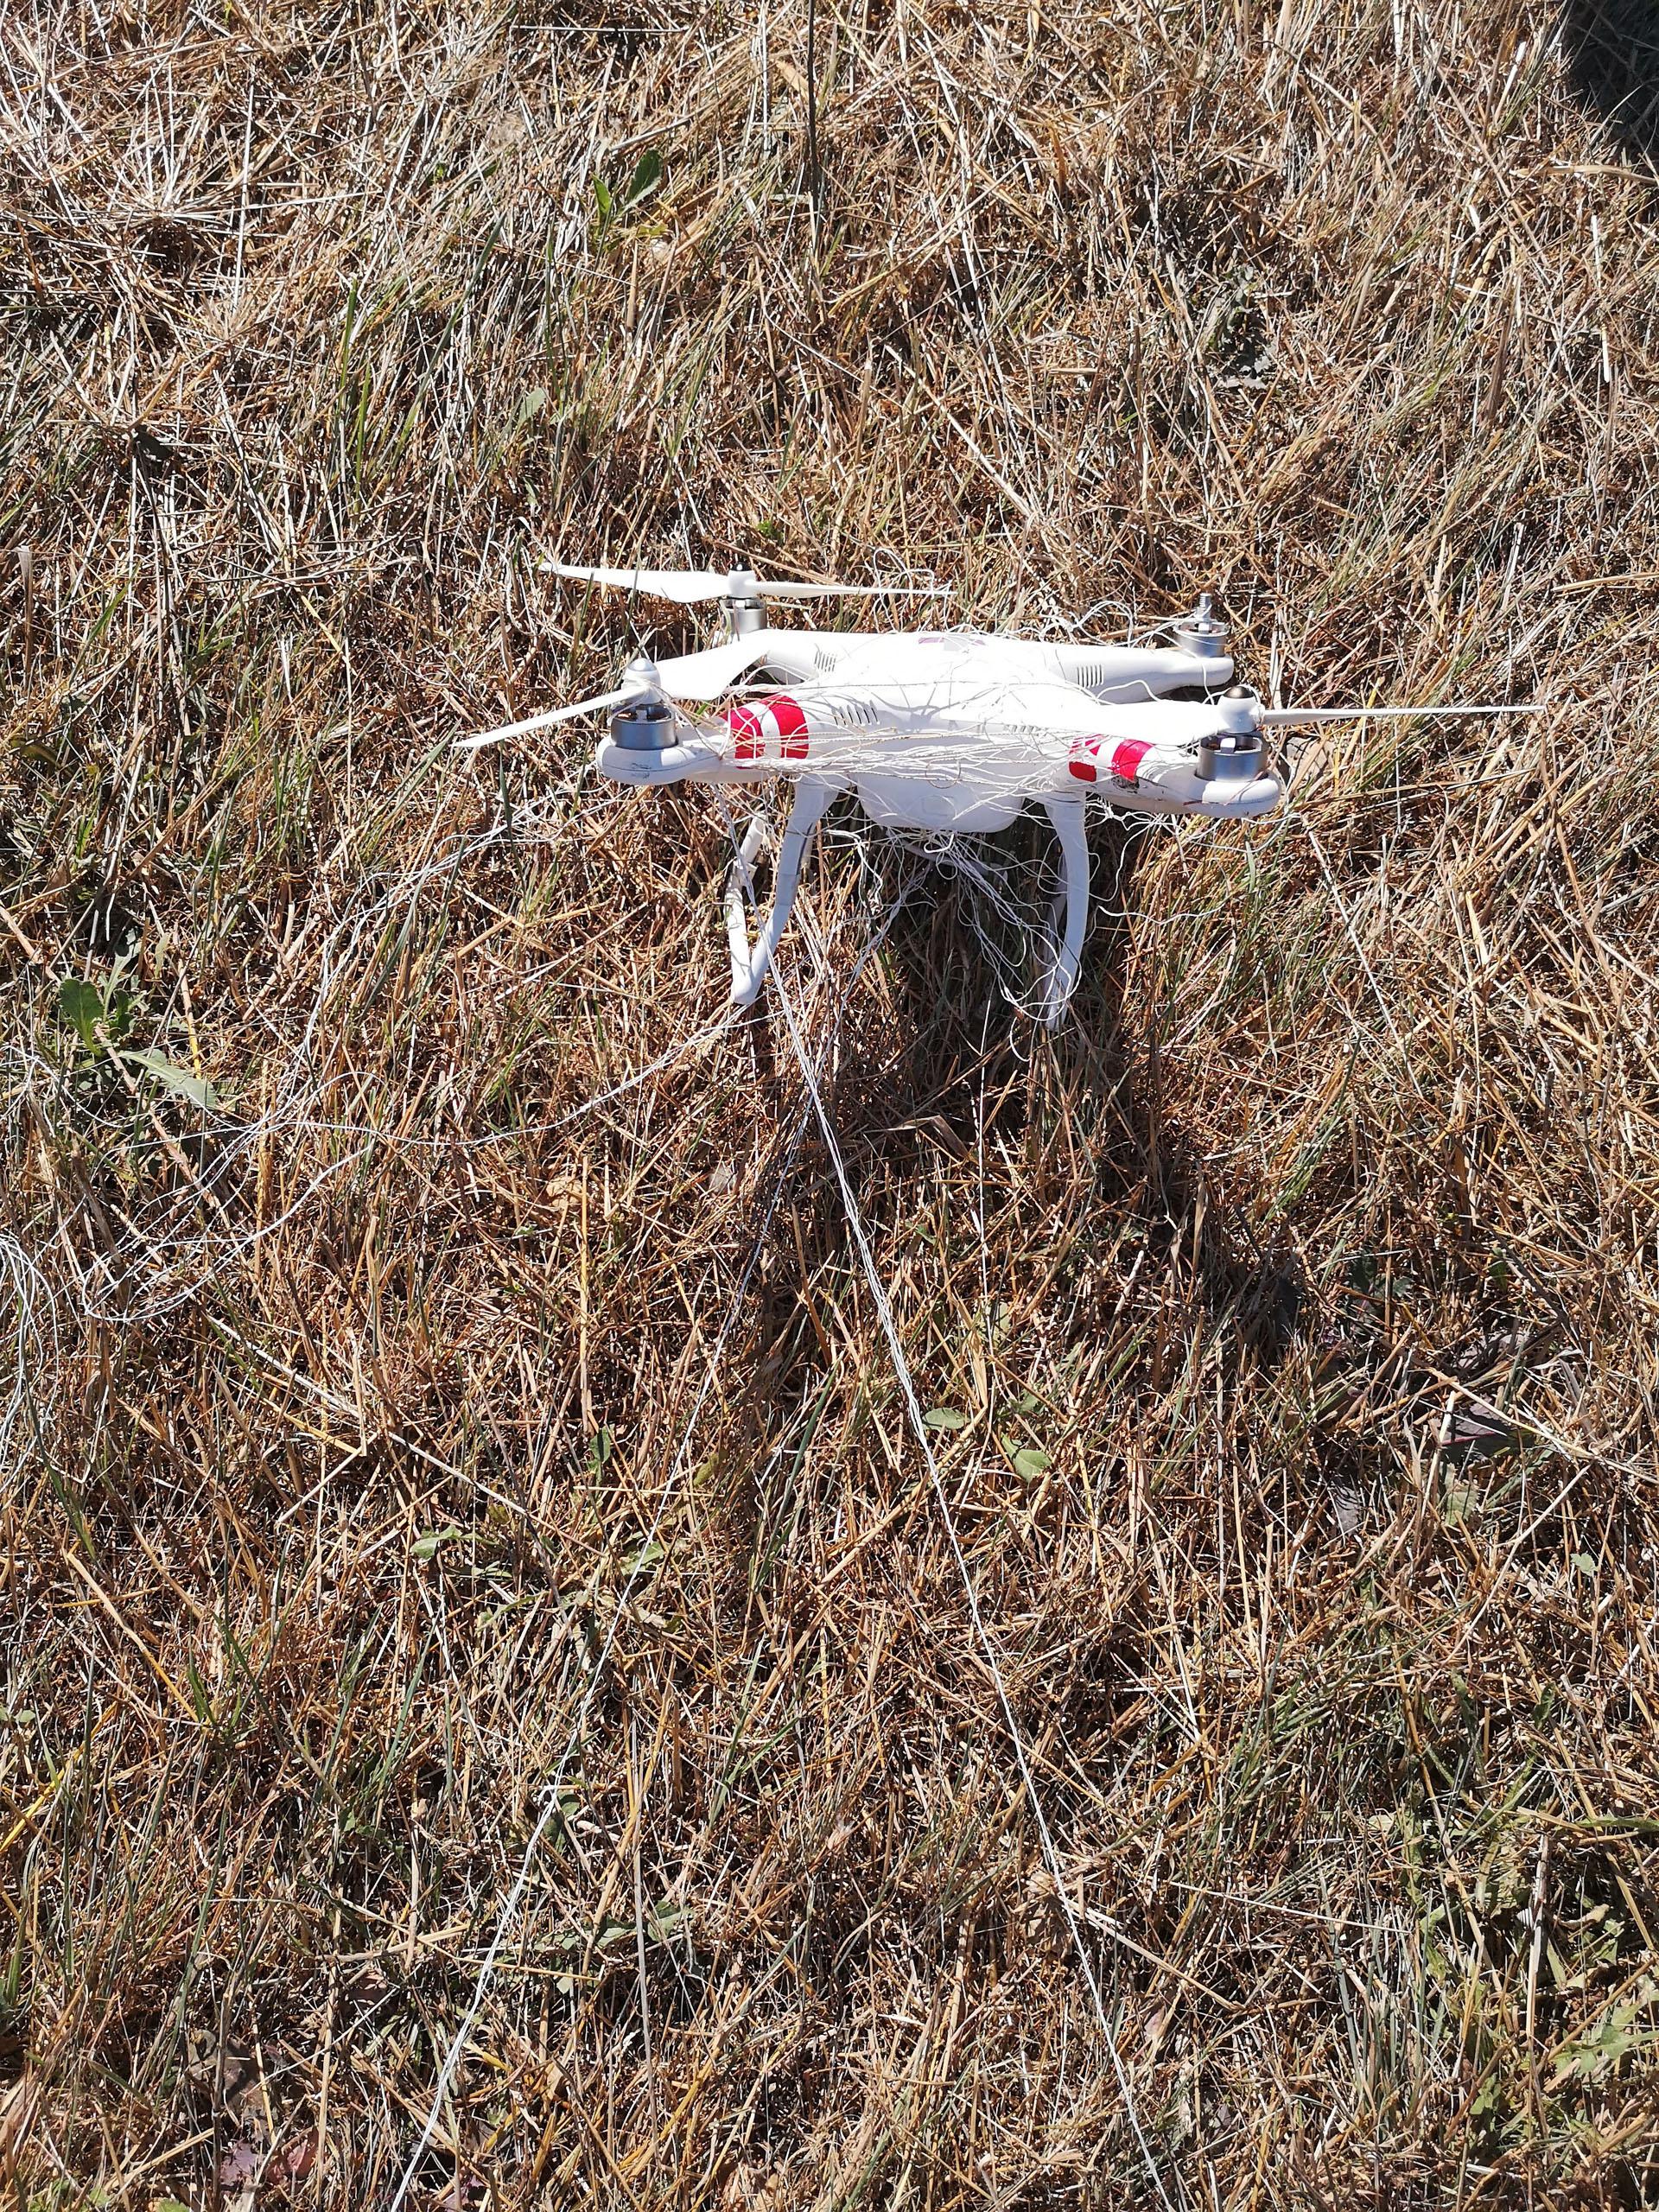 Droptec et son filet anti-drone